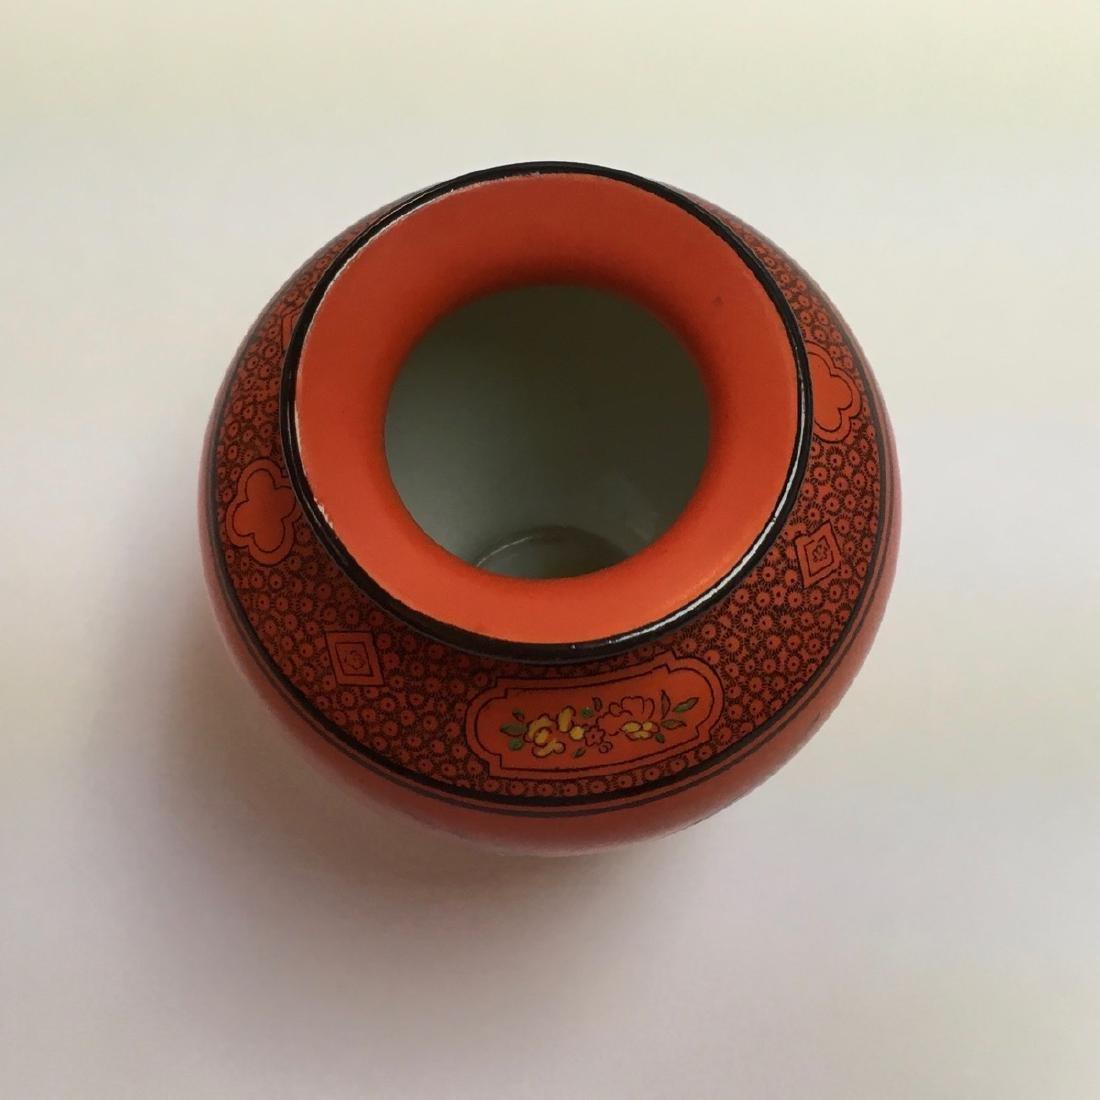 Vintage & Collectable SHELLEY(England) Orange Pottery - 3